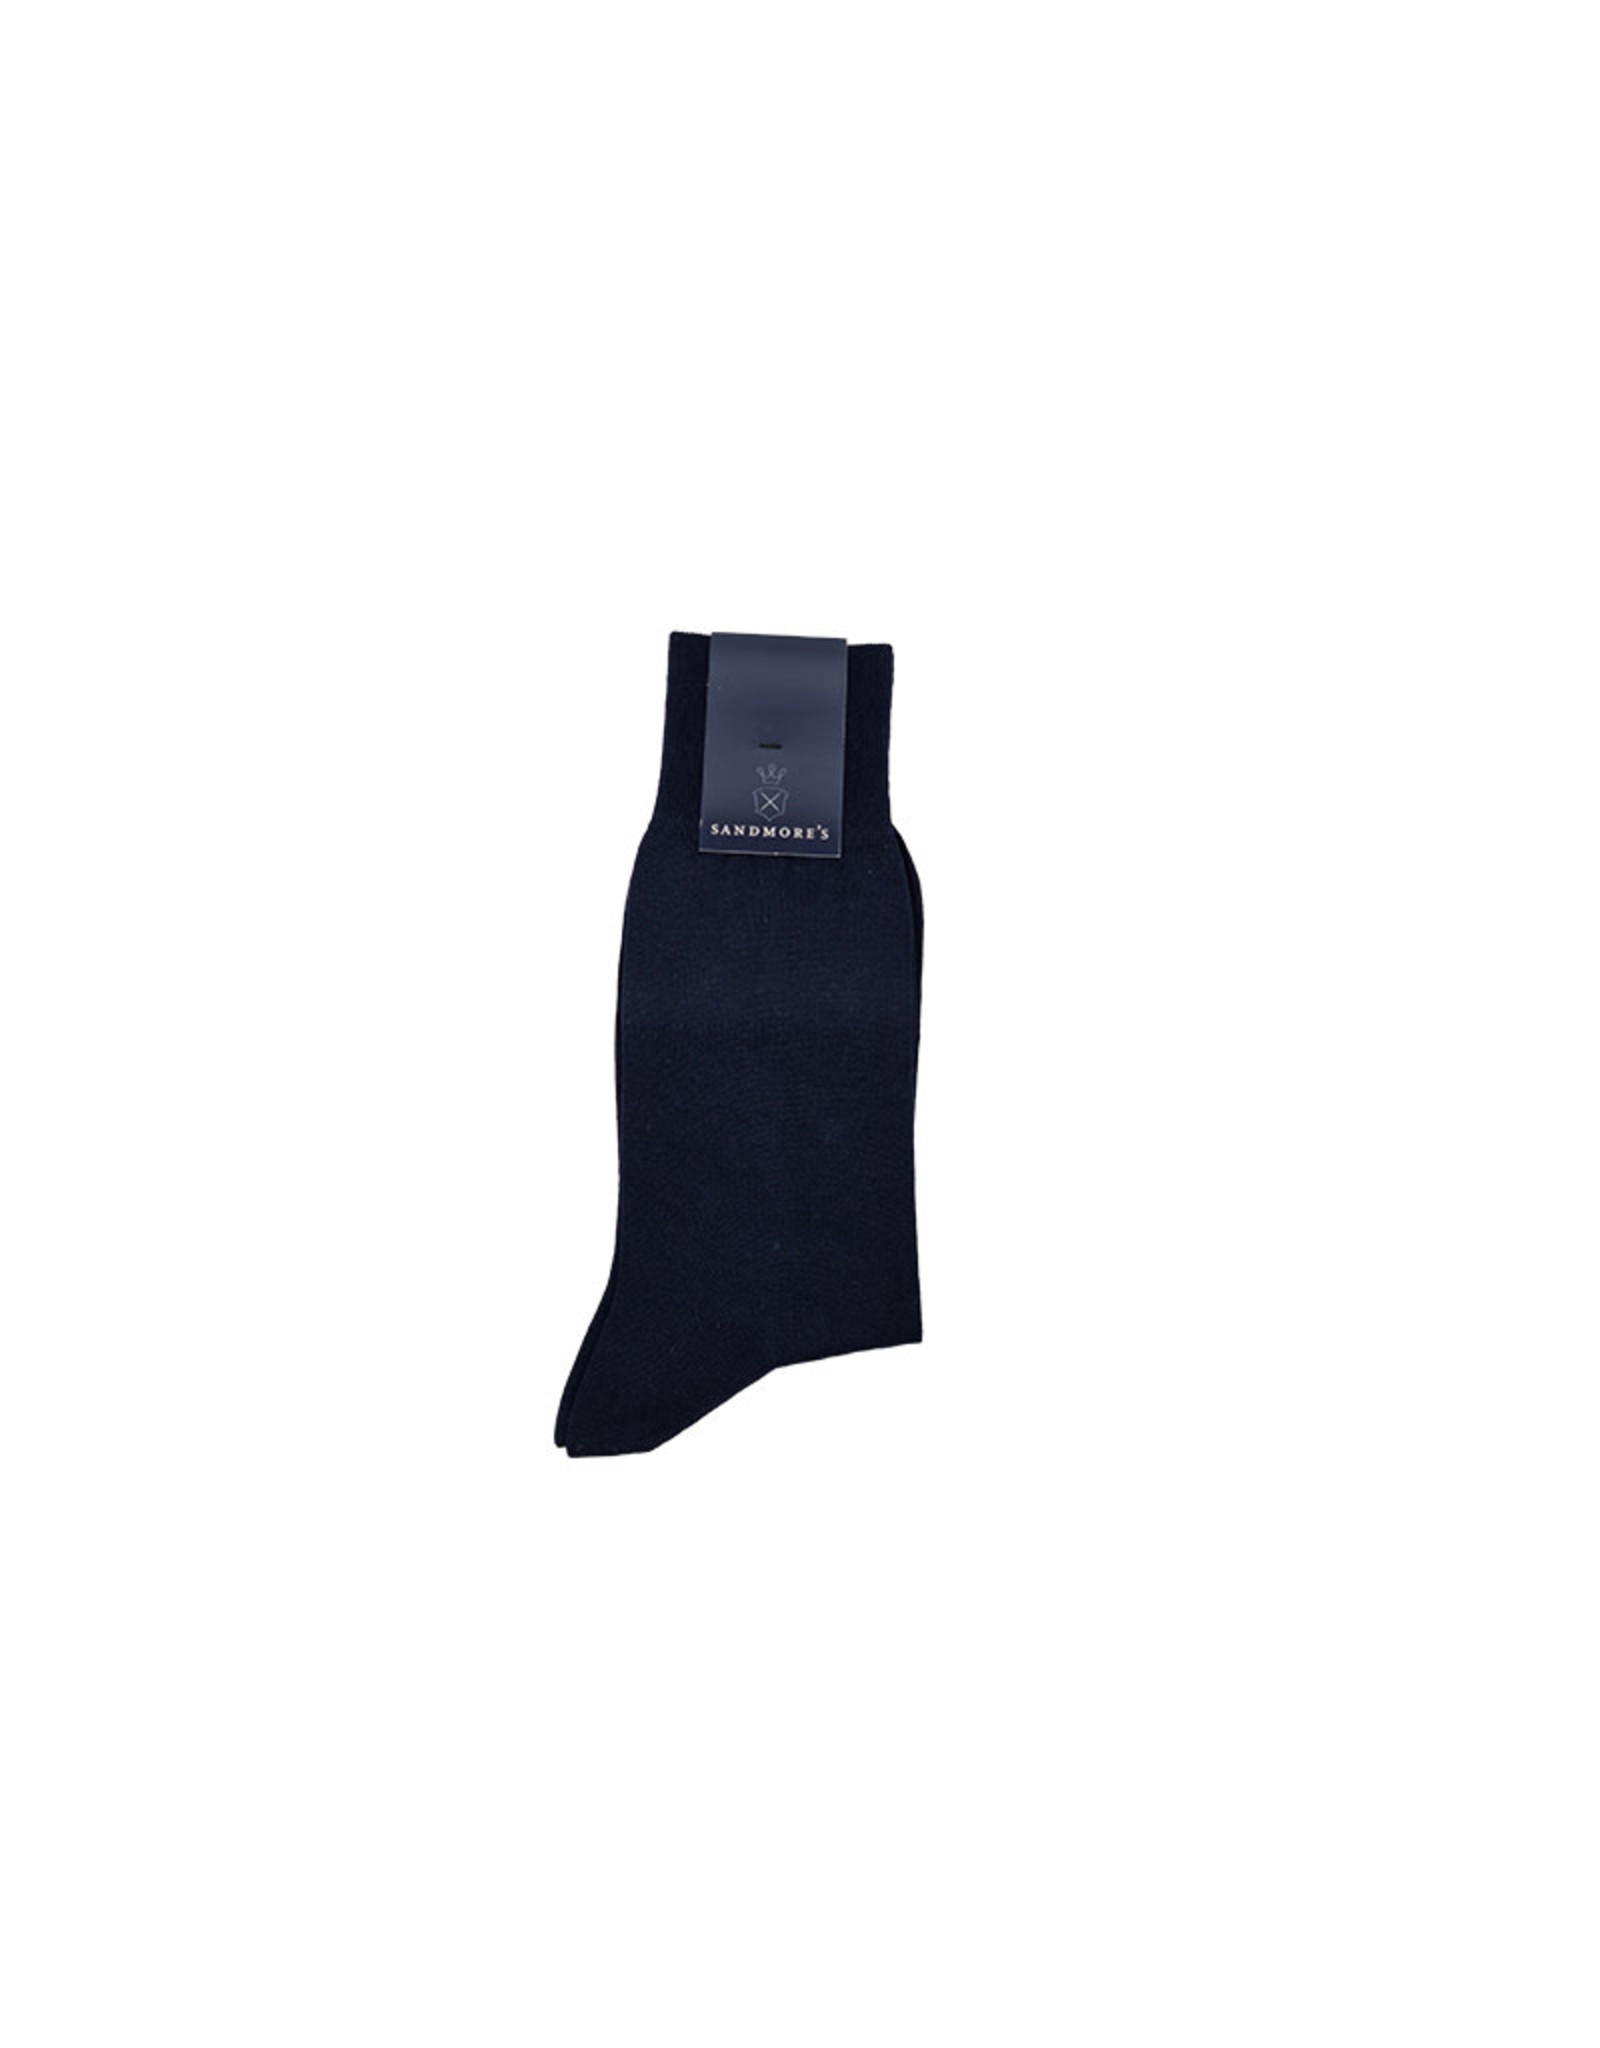 Russo Italia Sandmore's sokken katoen marine M338